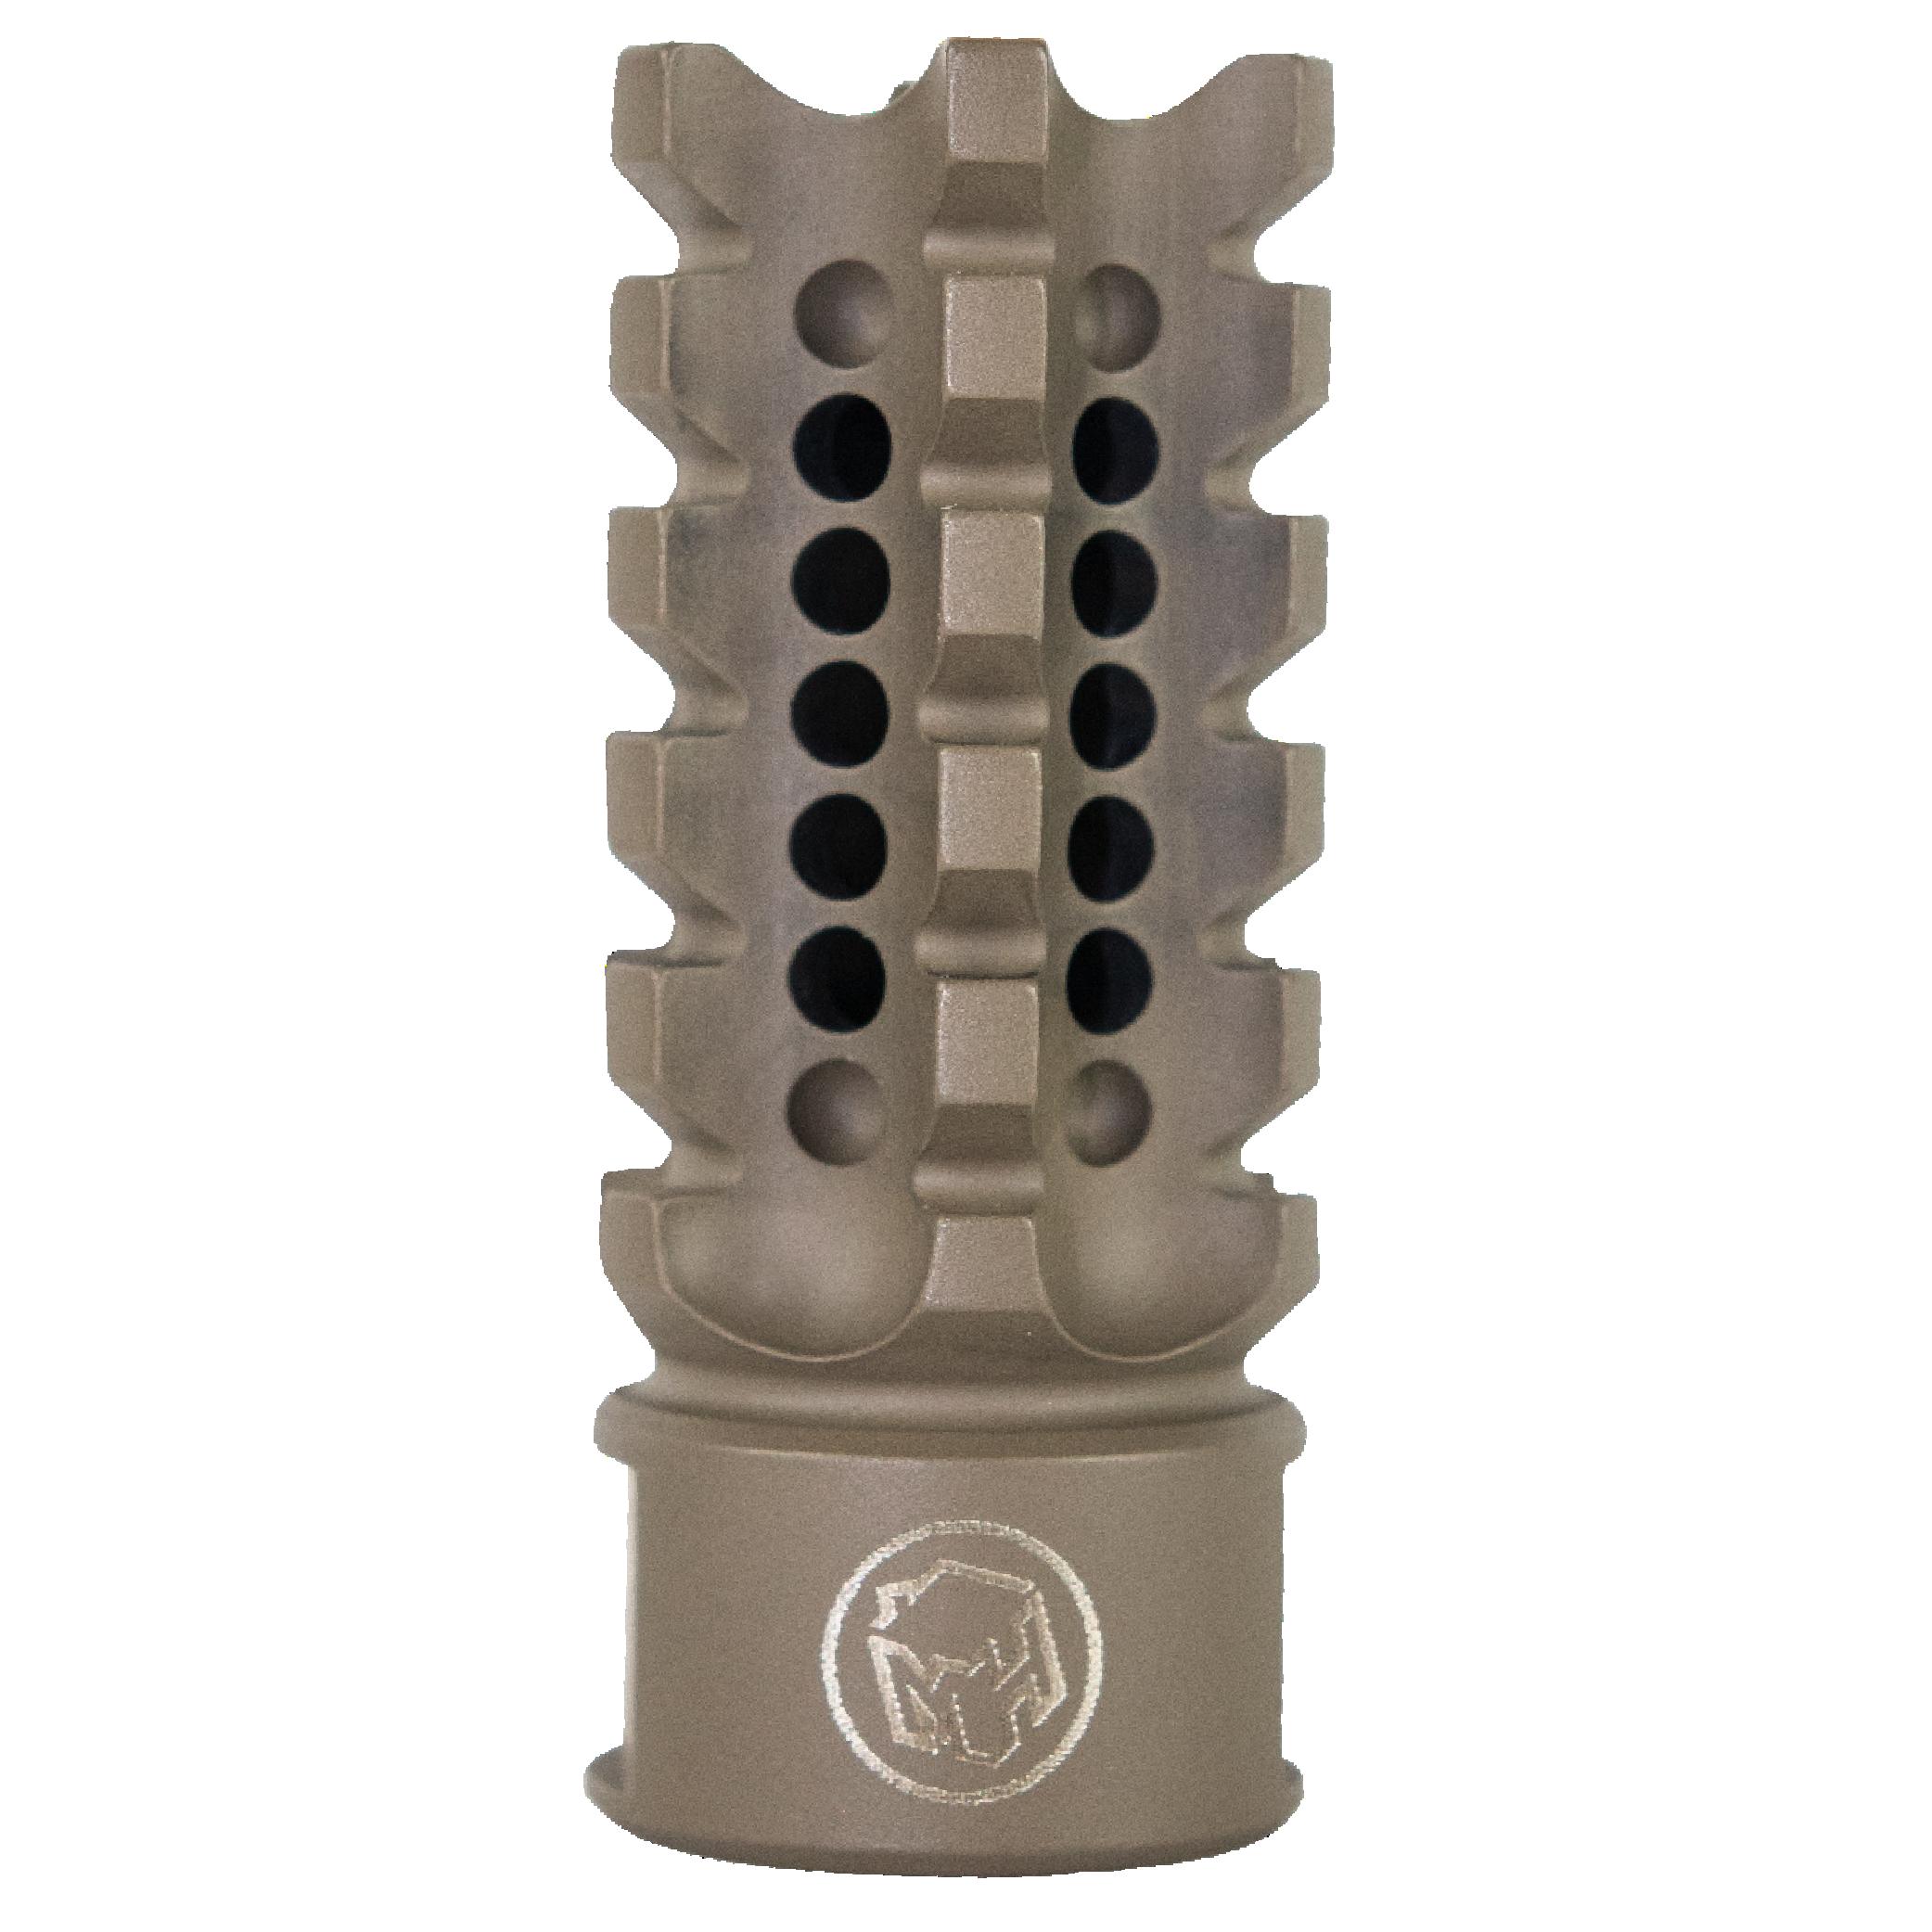 Madhouse Design XHC Flat Earth Serrated 223rem Muzzle Brake